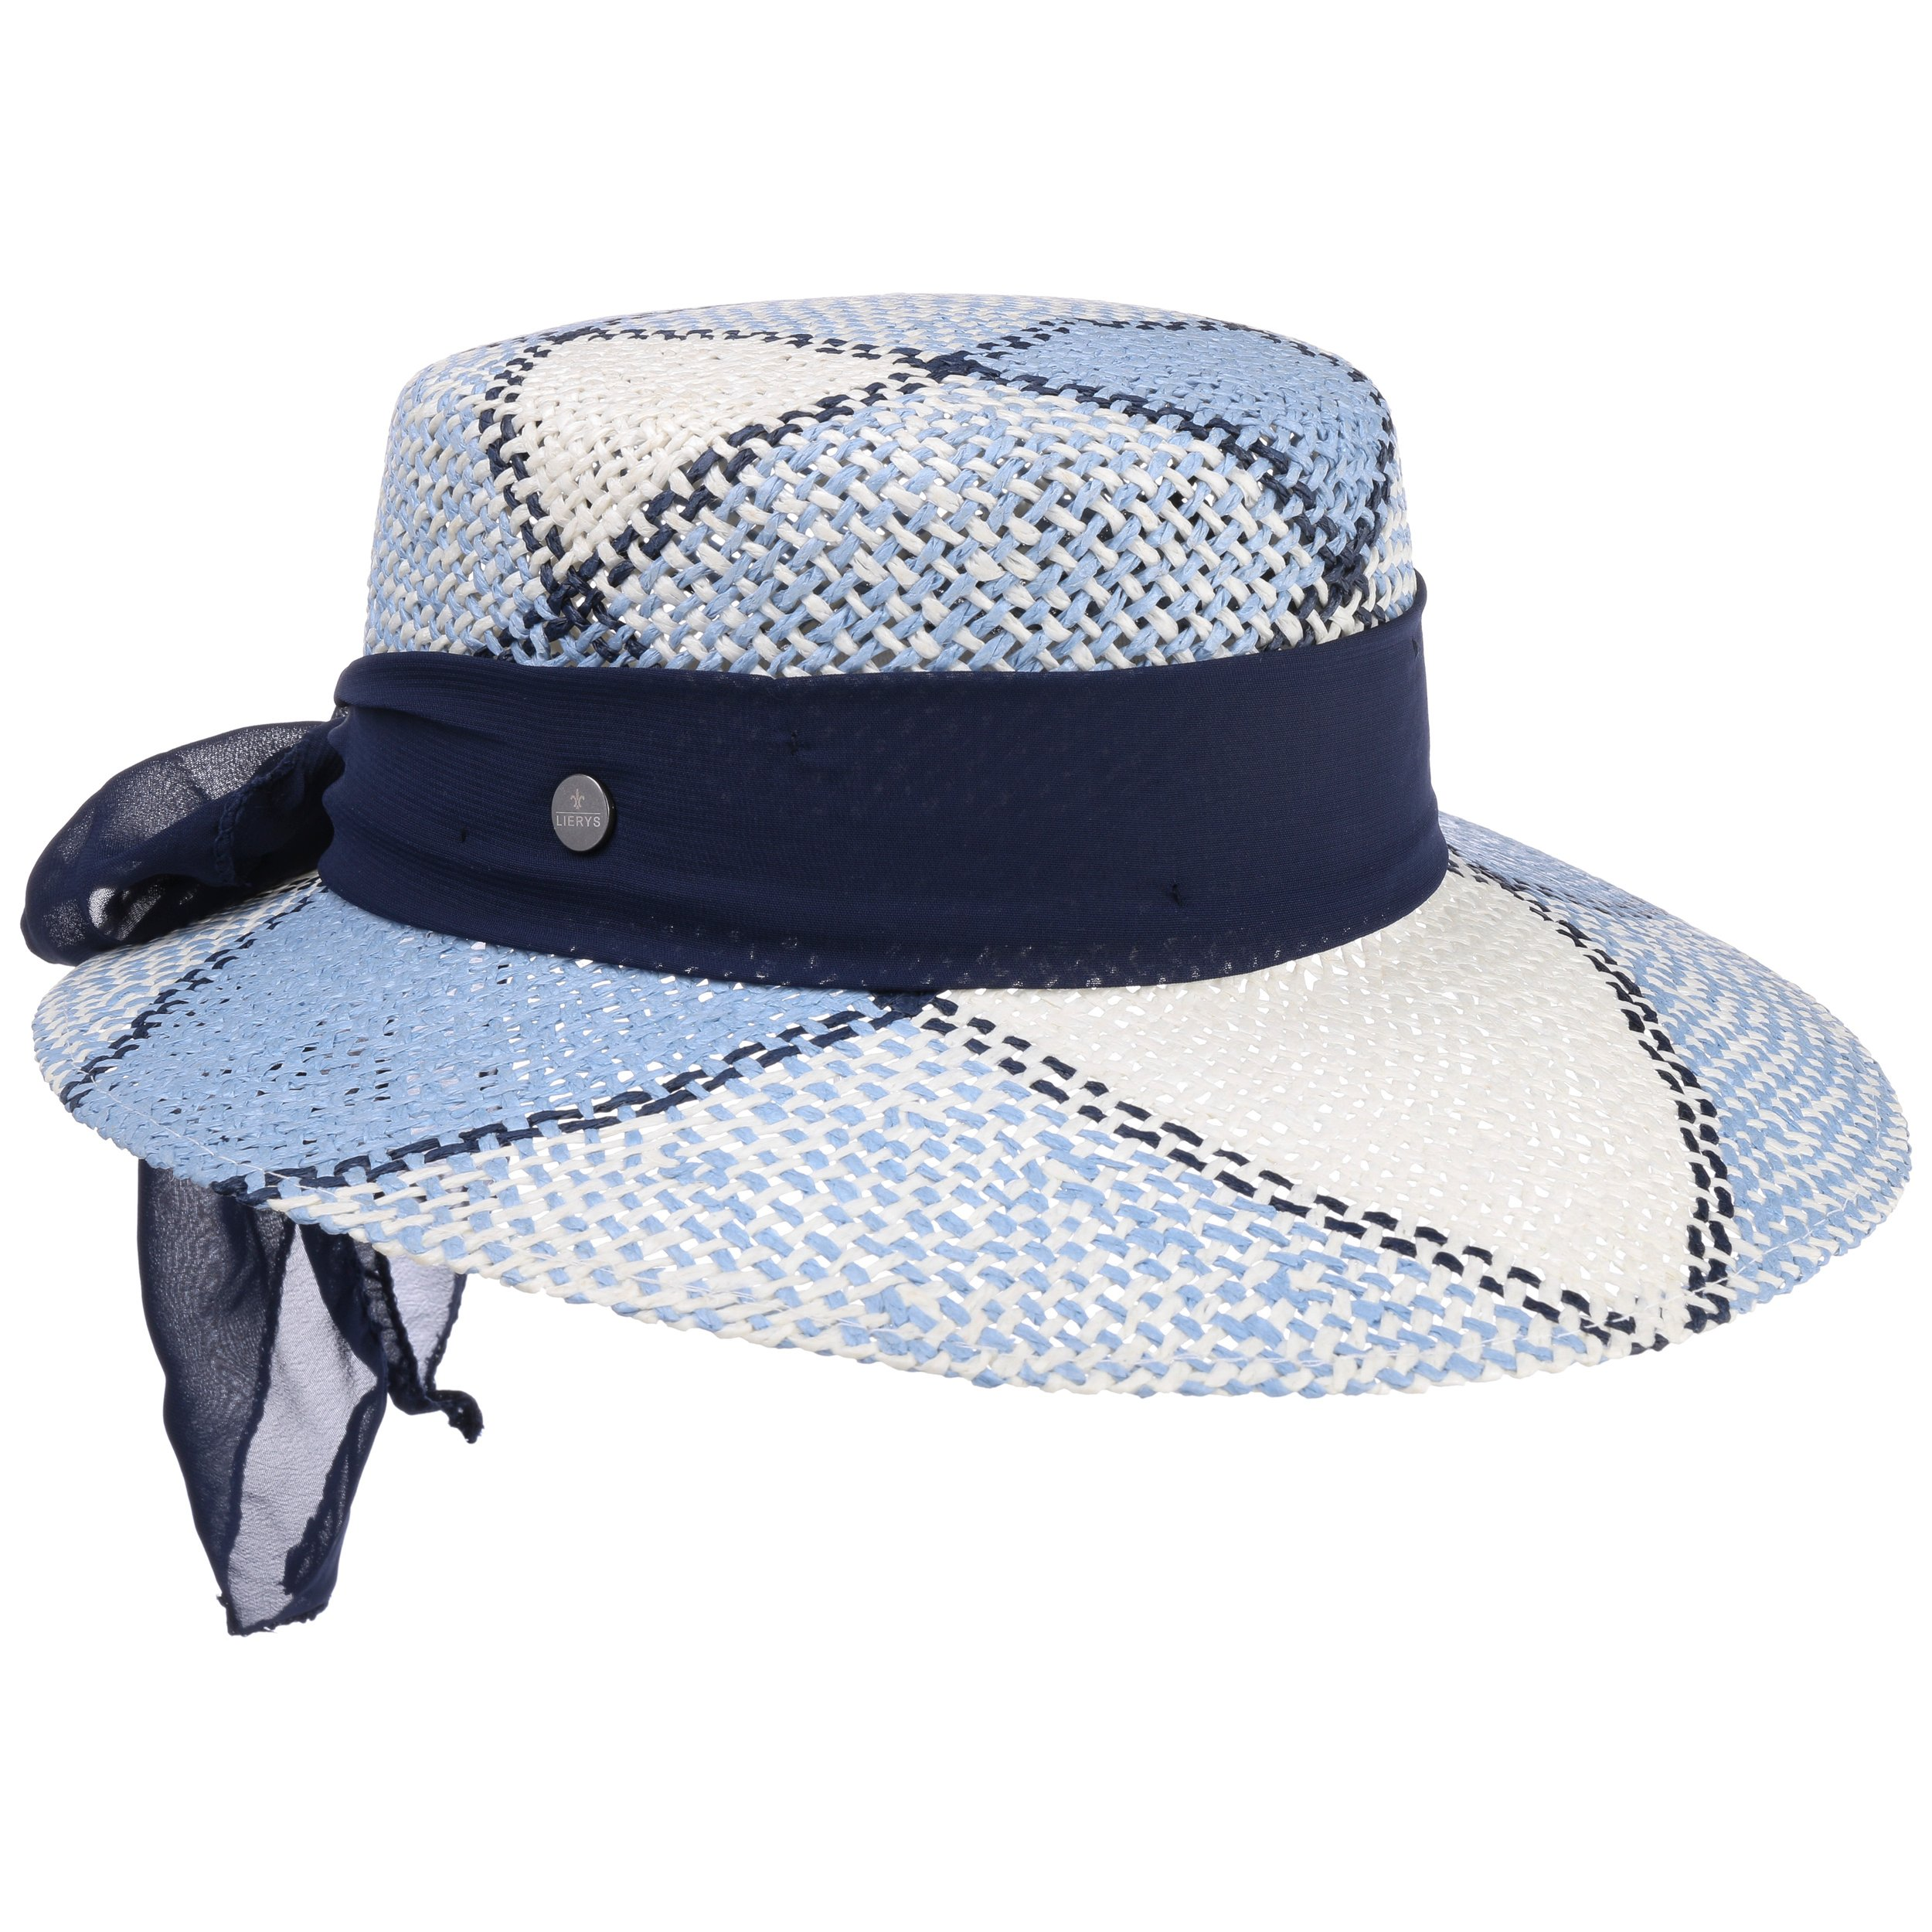 96b183f37c6 ... Straw Hat with Cloth Band by Lierys - blue 5